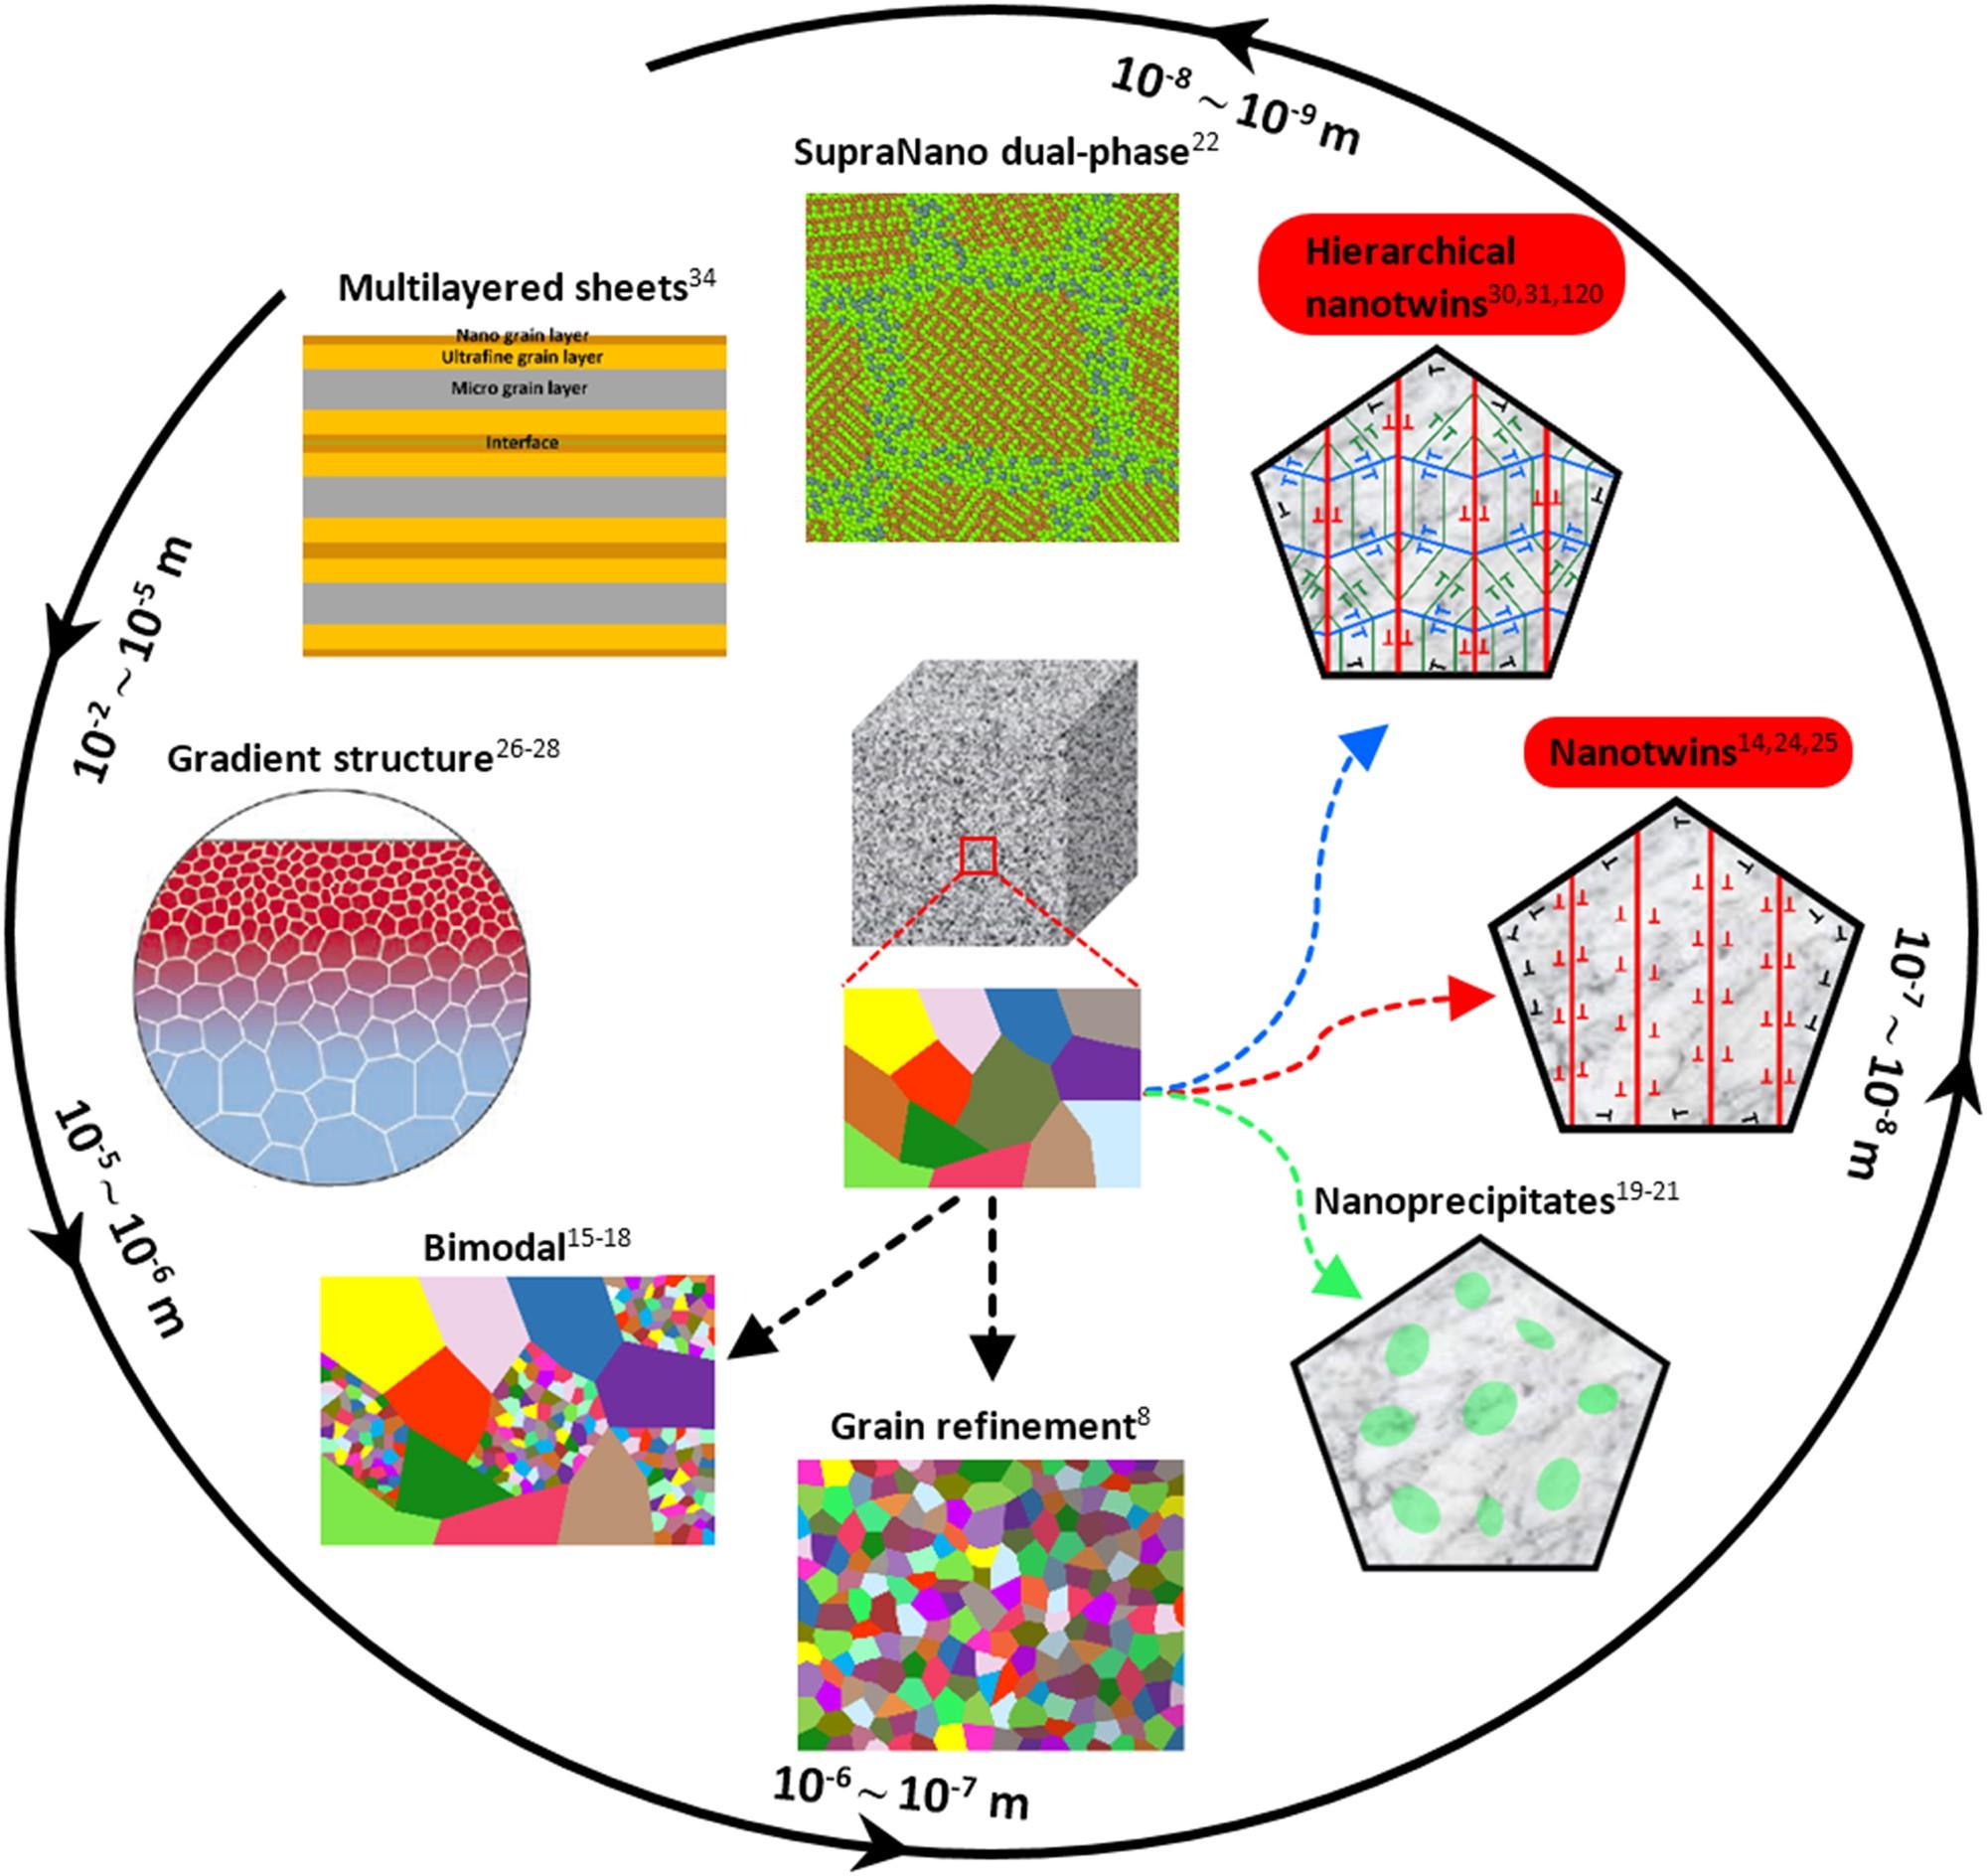 Nanotwinned And Hierarchical Metals A Review Of Gnoringopticalsensor Sensorcircuit Circuit Diagram Seekiccom Experimental Computational Theoretical Efforts Npj Materials